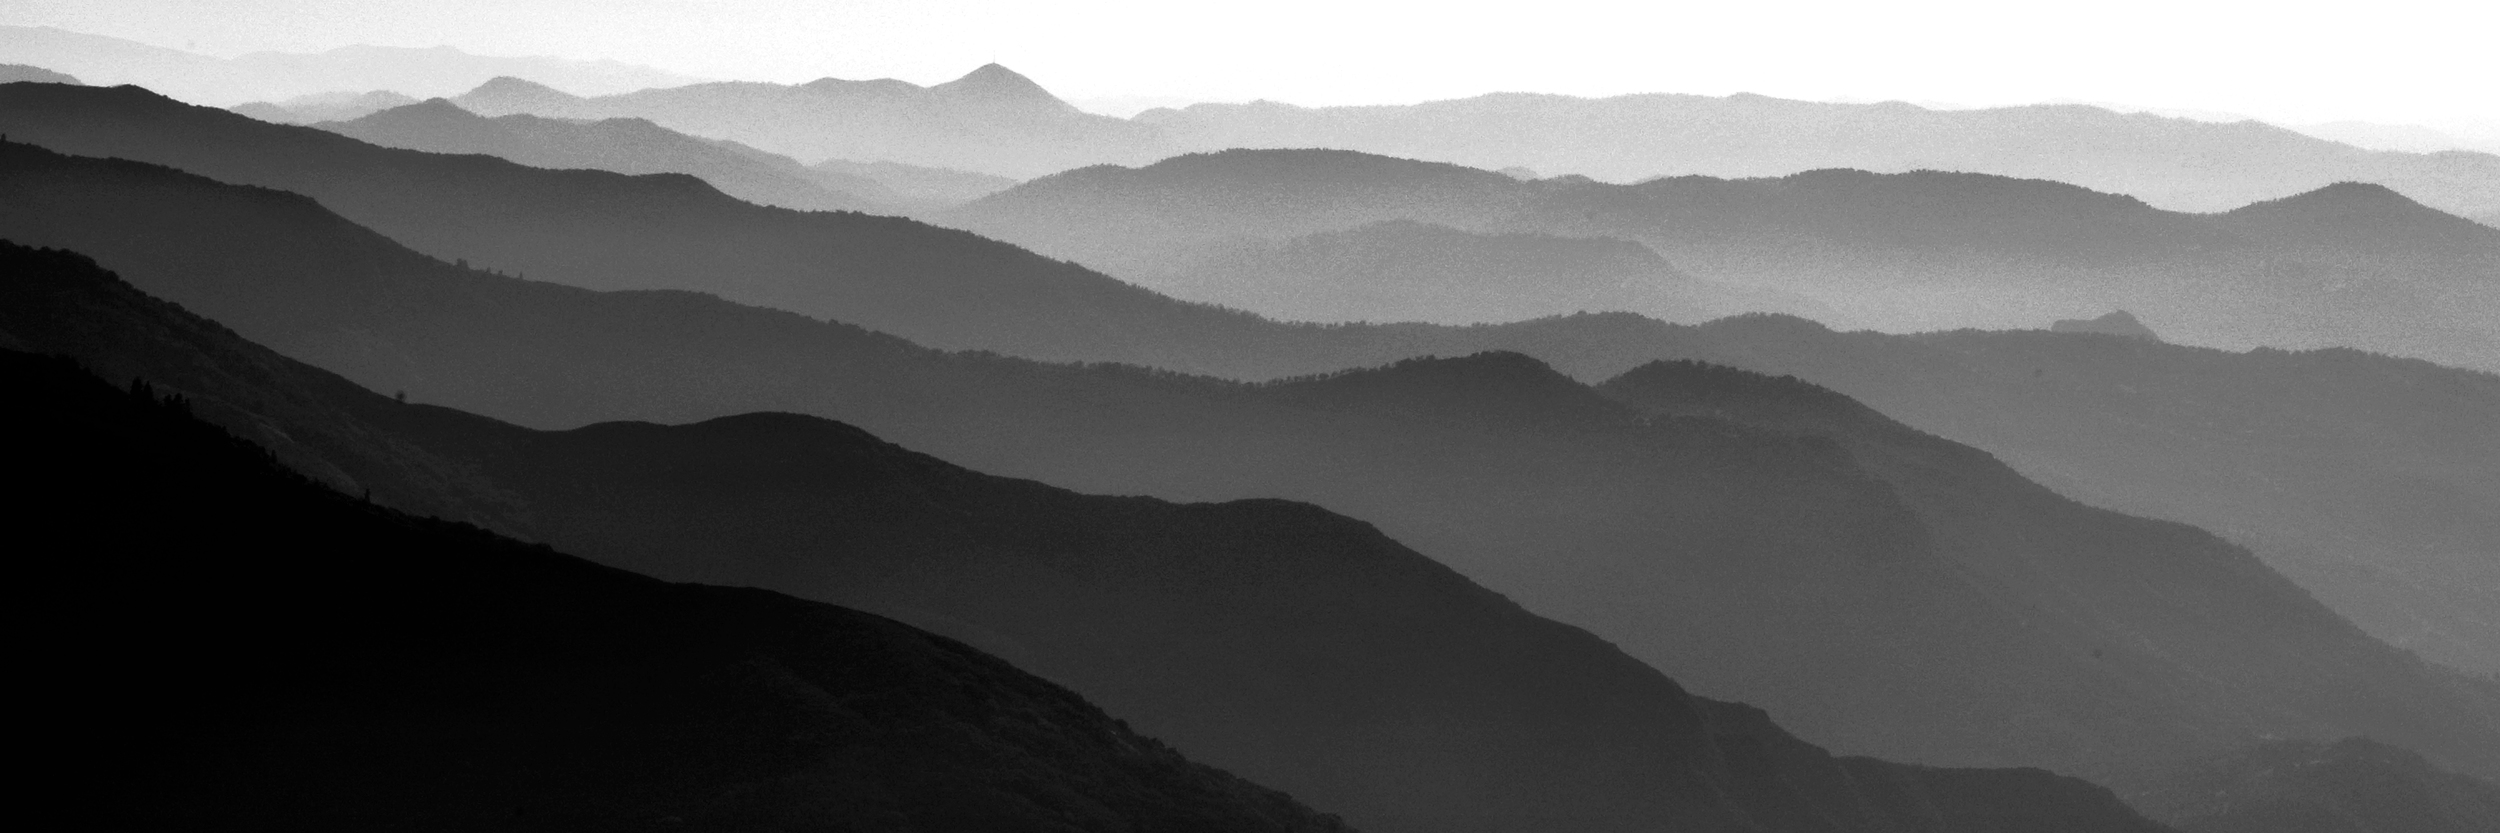 Misty Mountains B&W(pano).jpg